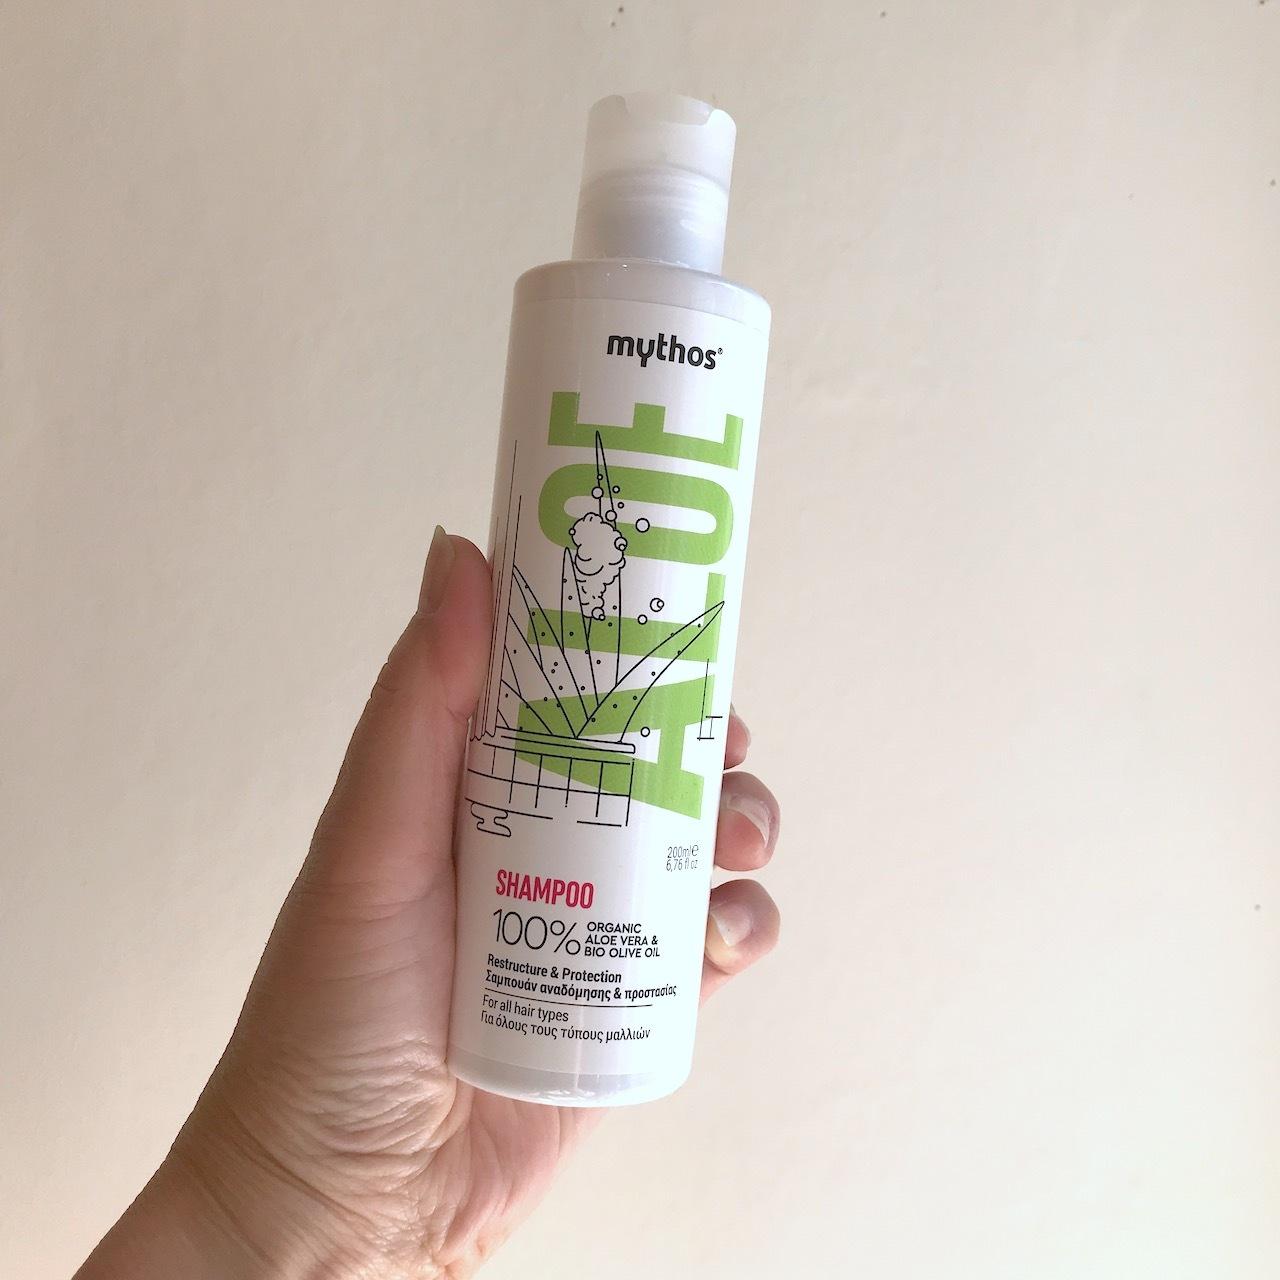 """ Mythos Aloe shampoo /  ミトス シャンプー アロエ """